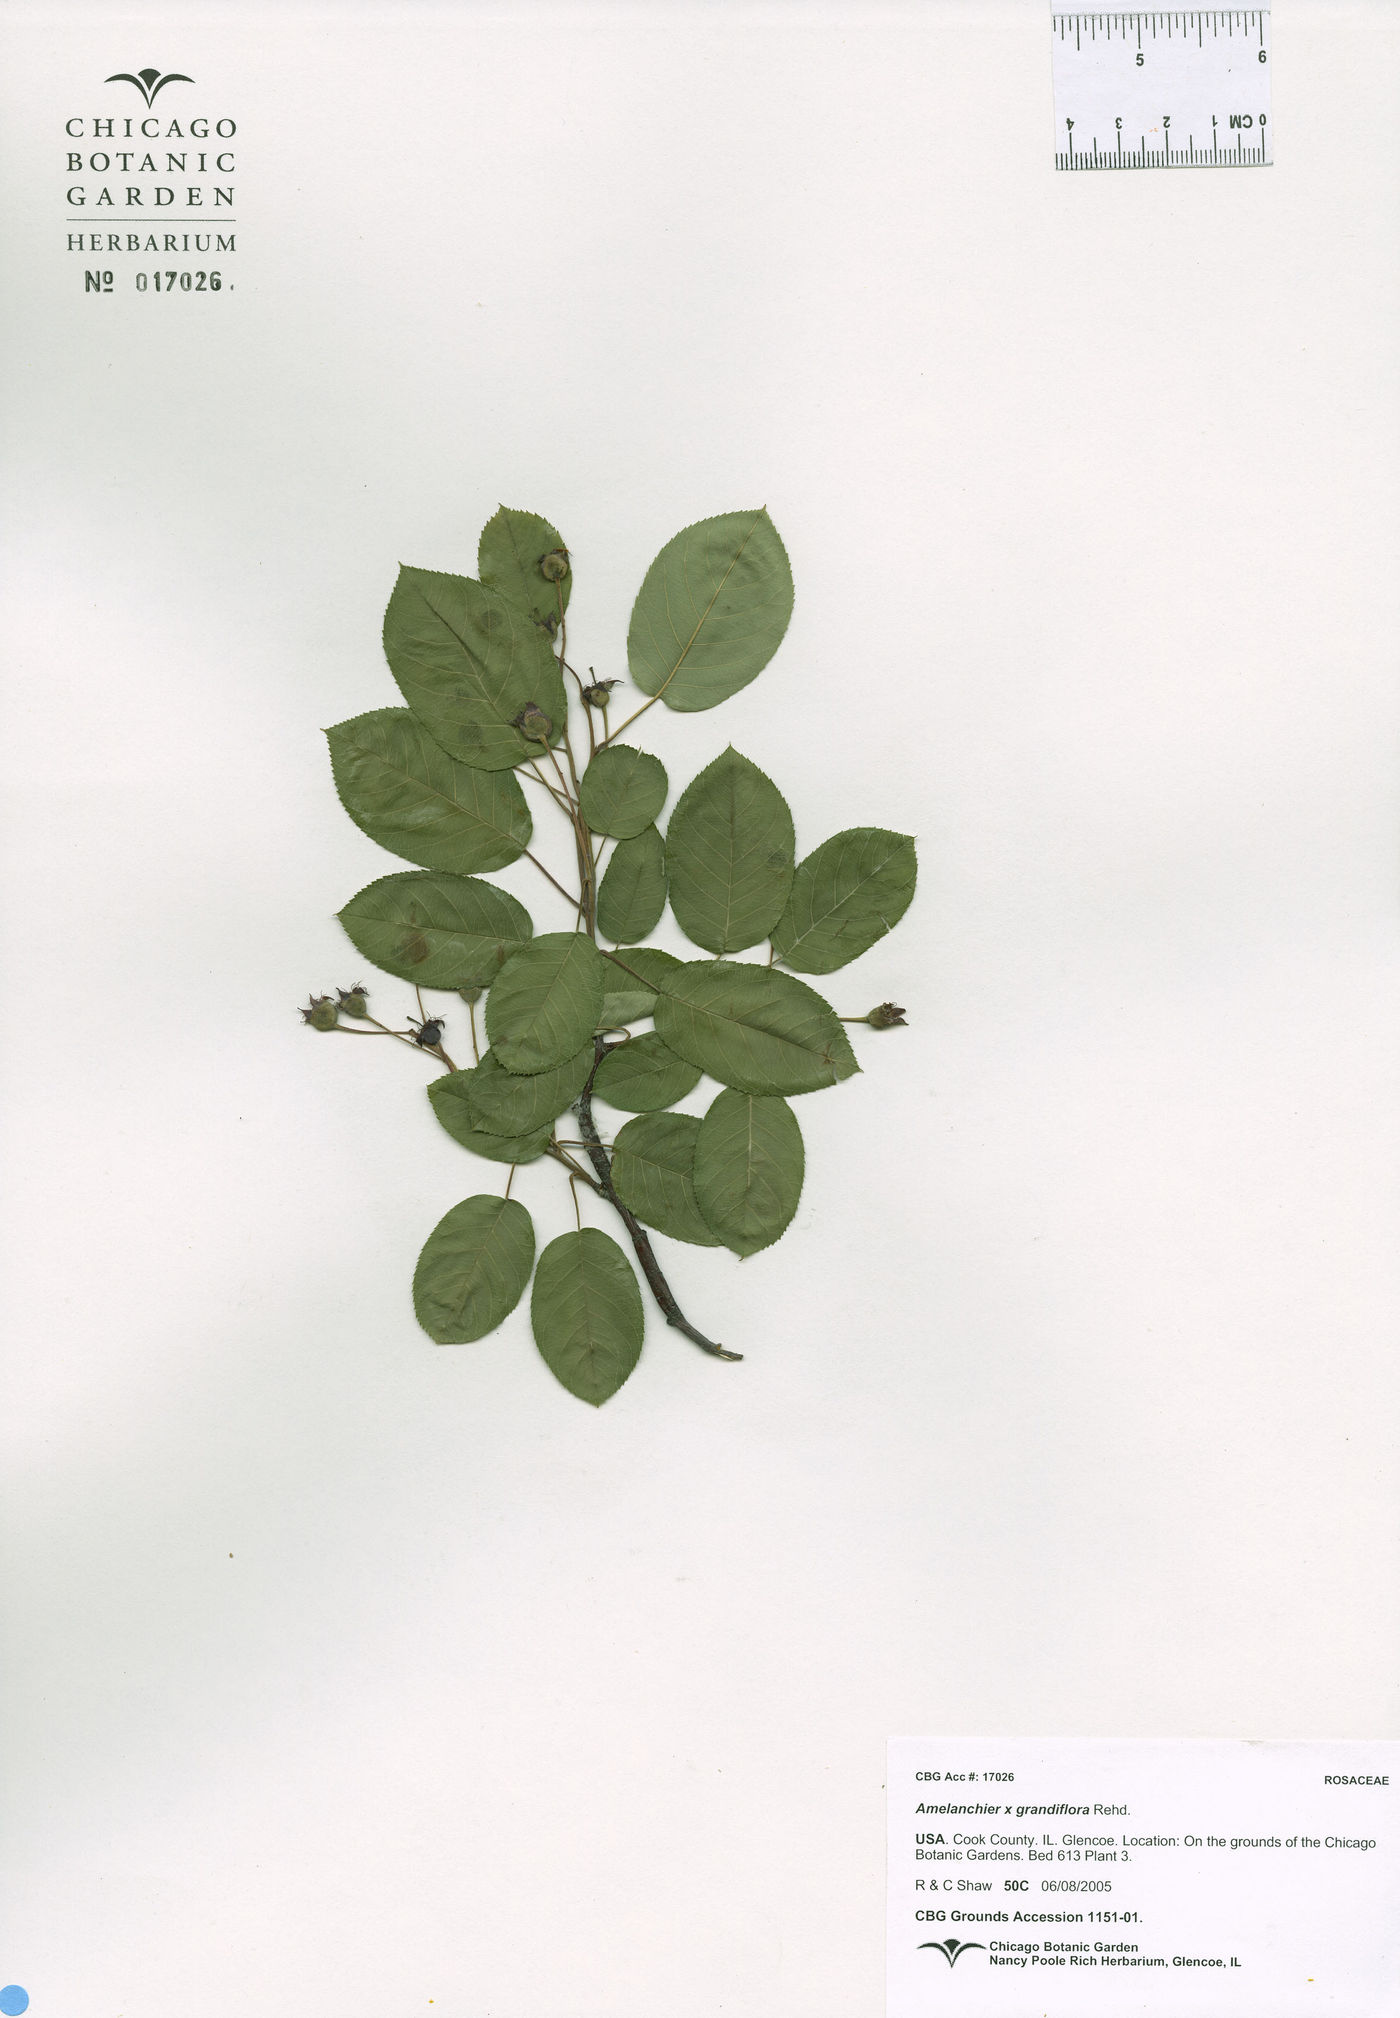 Amelanchier x grandiflora image